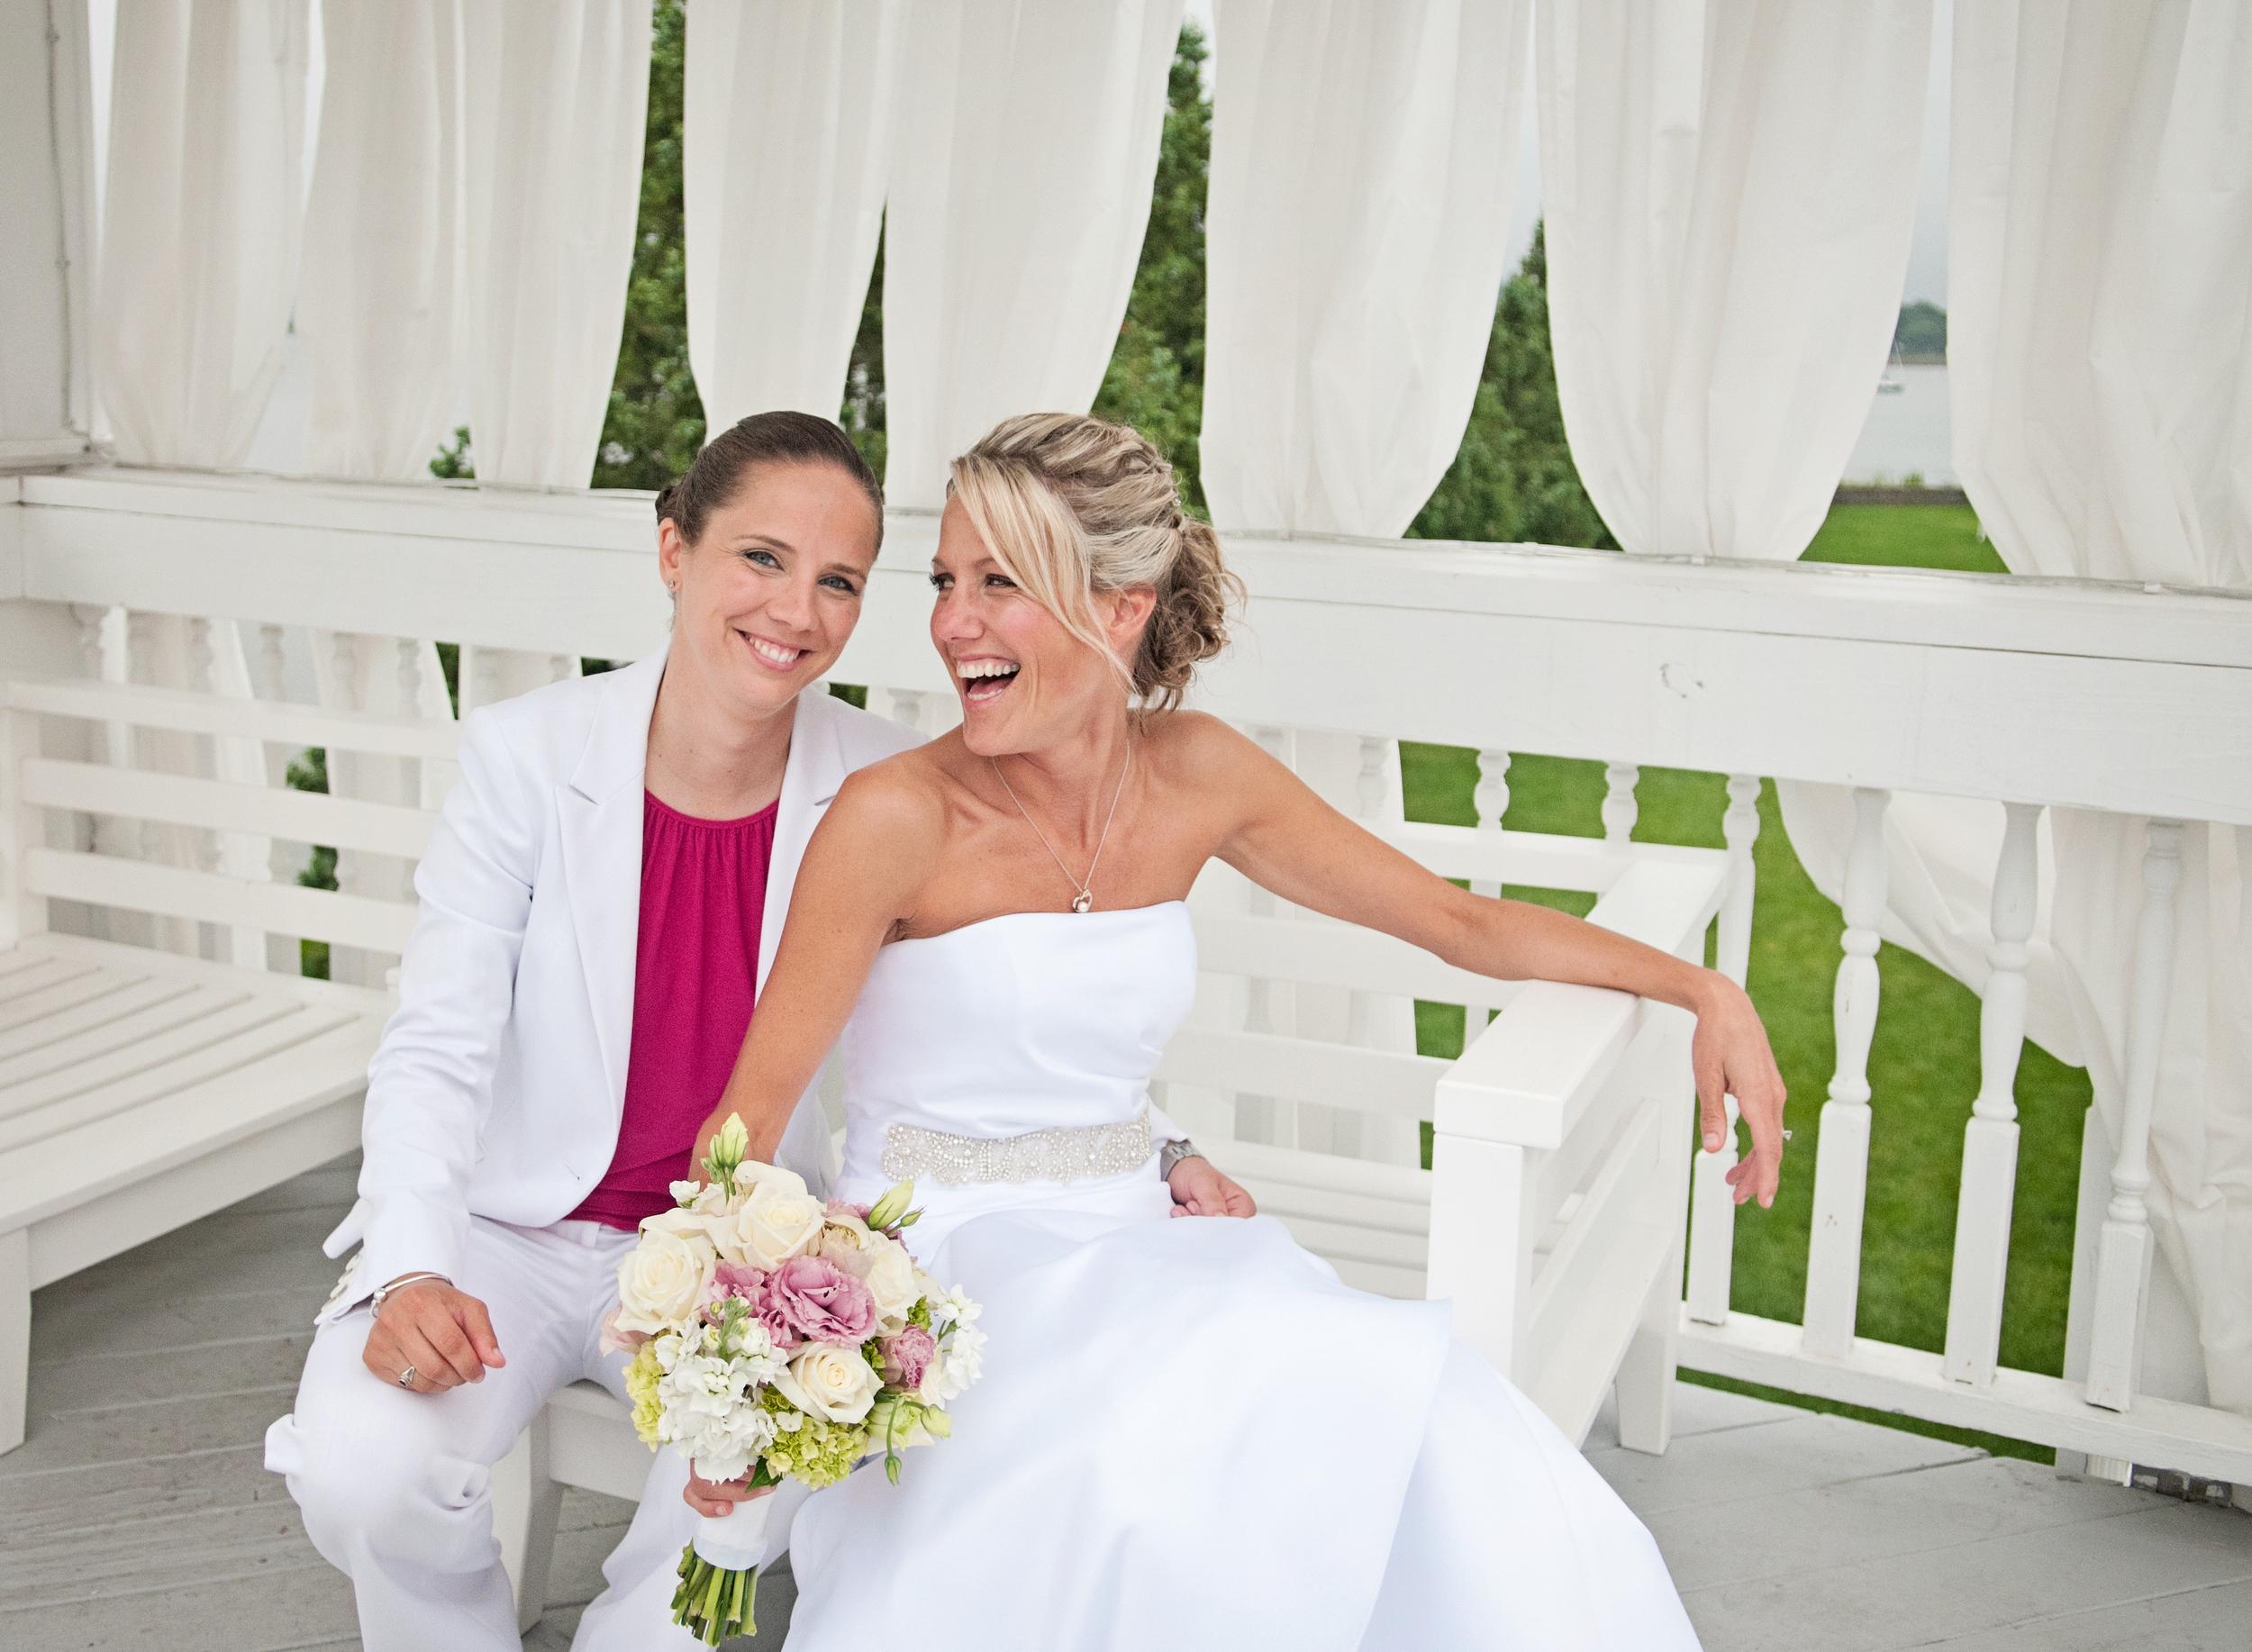 Angela_Chicoski_CT_wedding_photographer_047.jpg